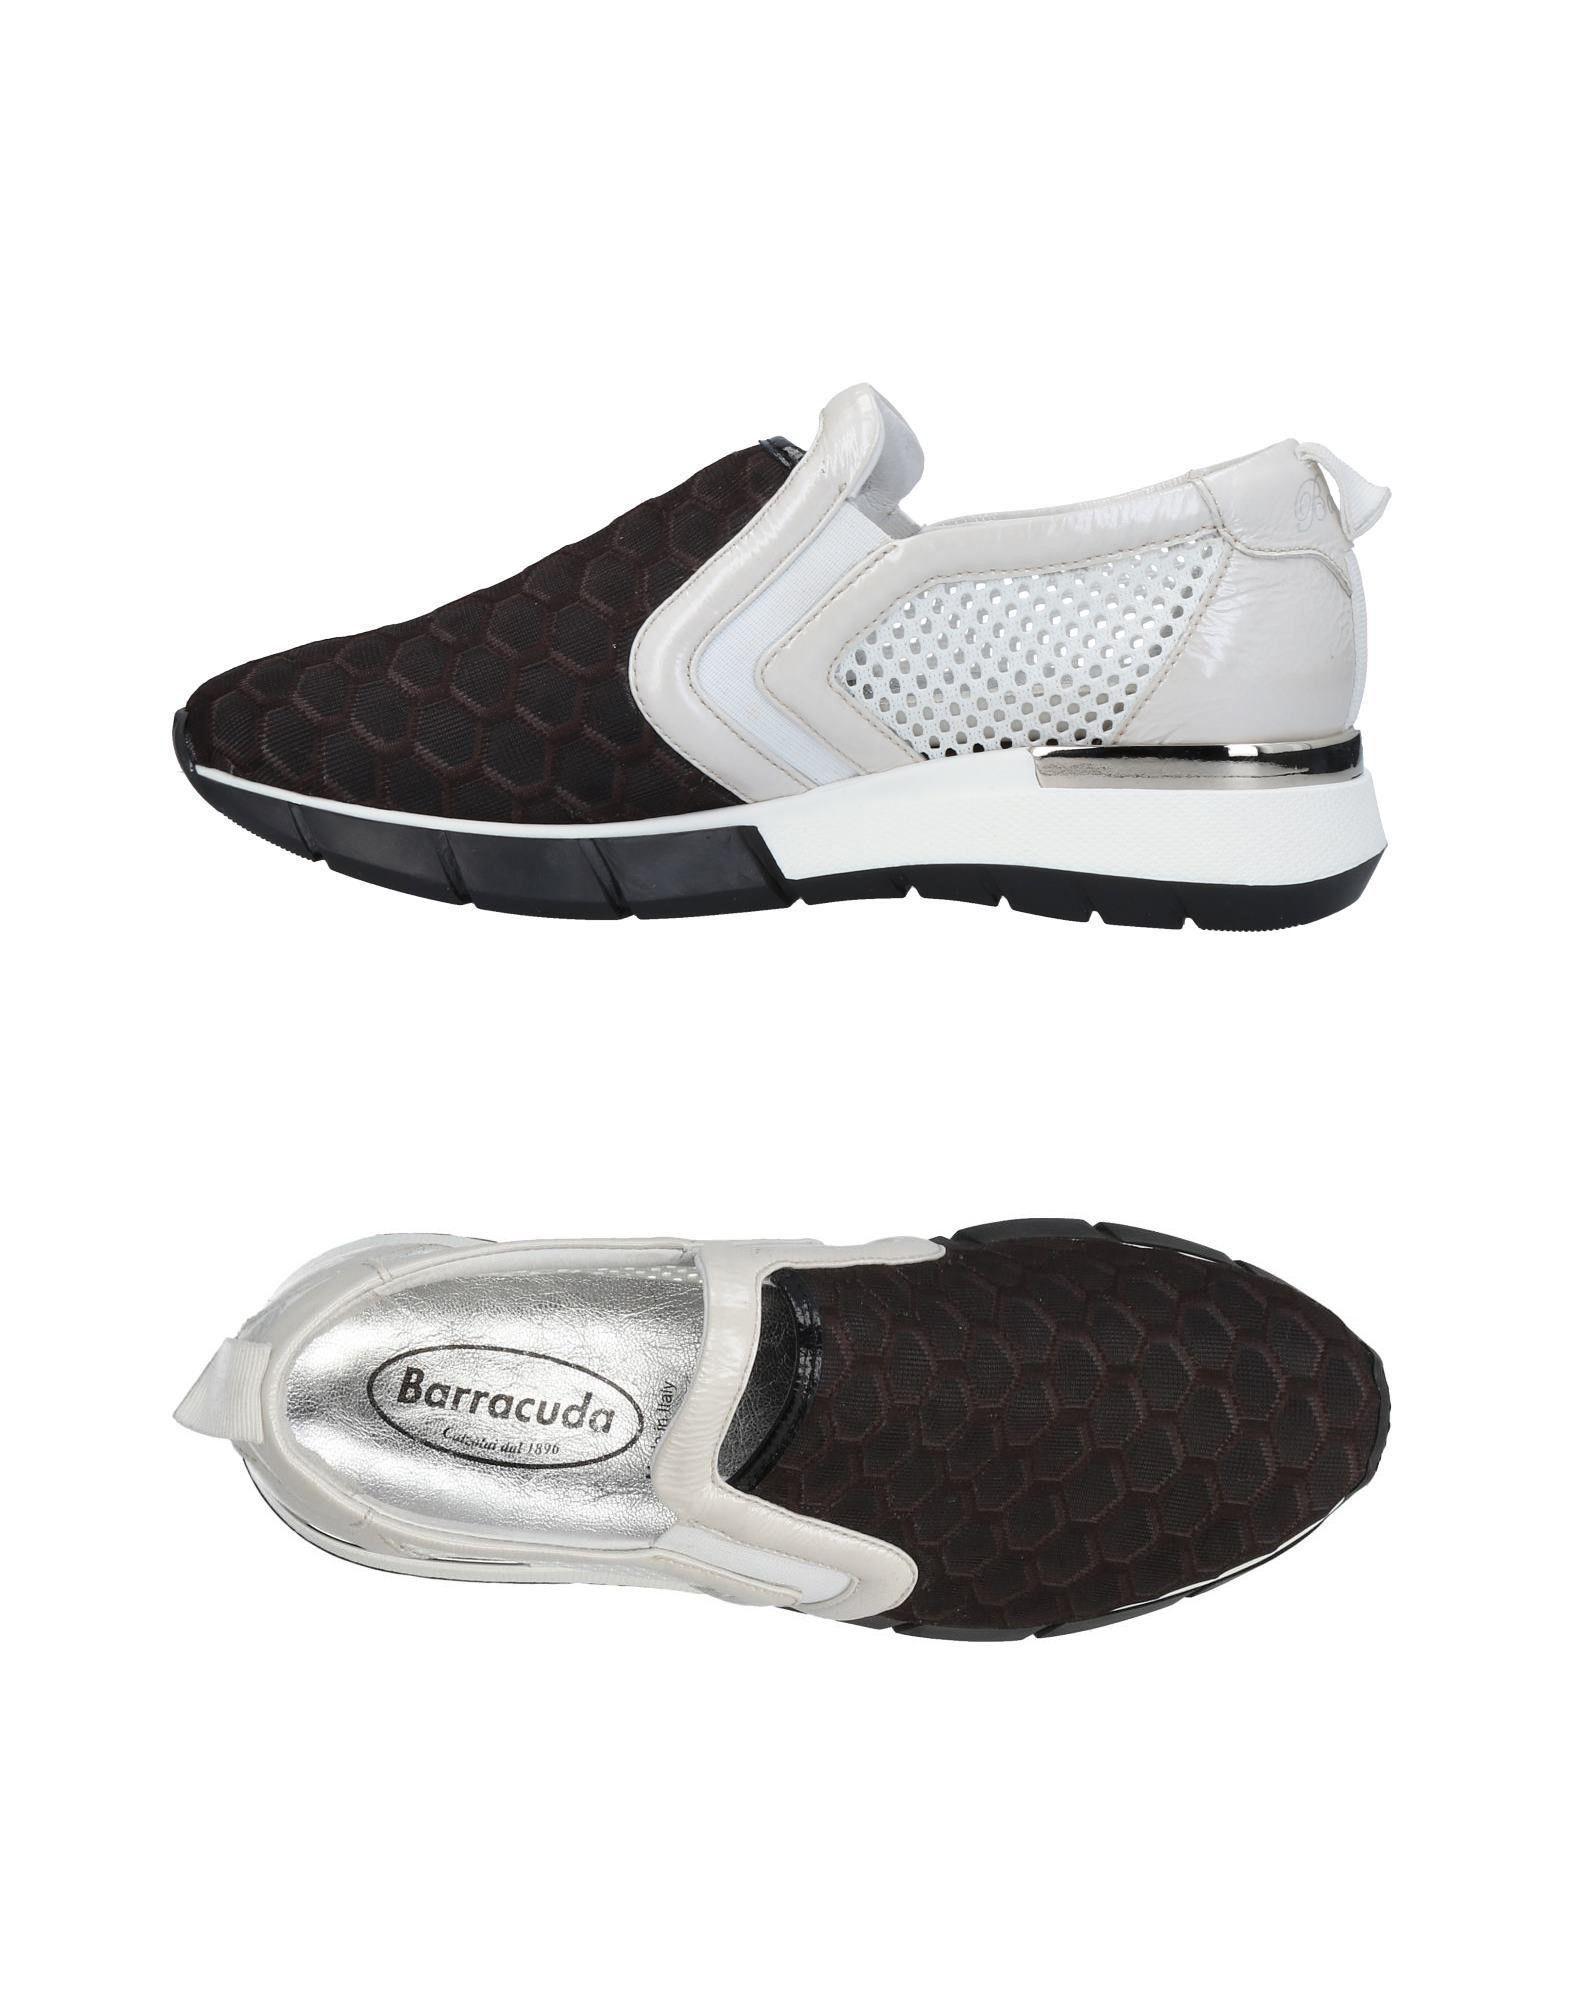 Chaussures - Bas-tops Et Baskets Barracuda jBxEhlWEml